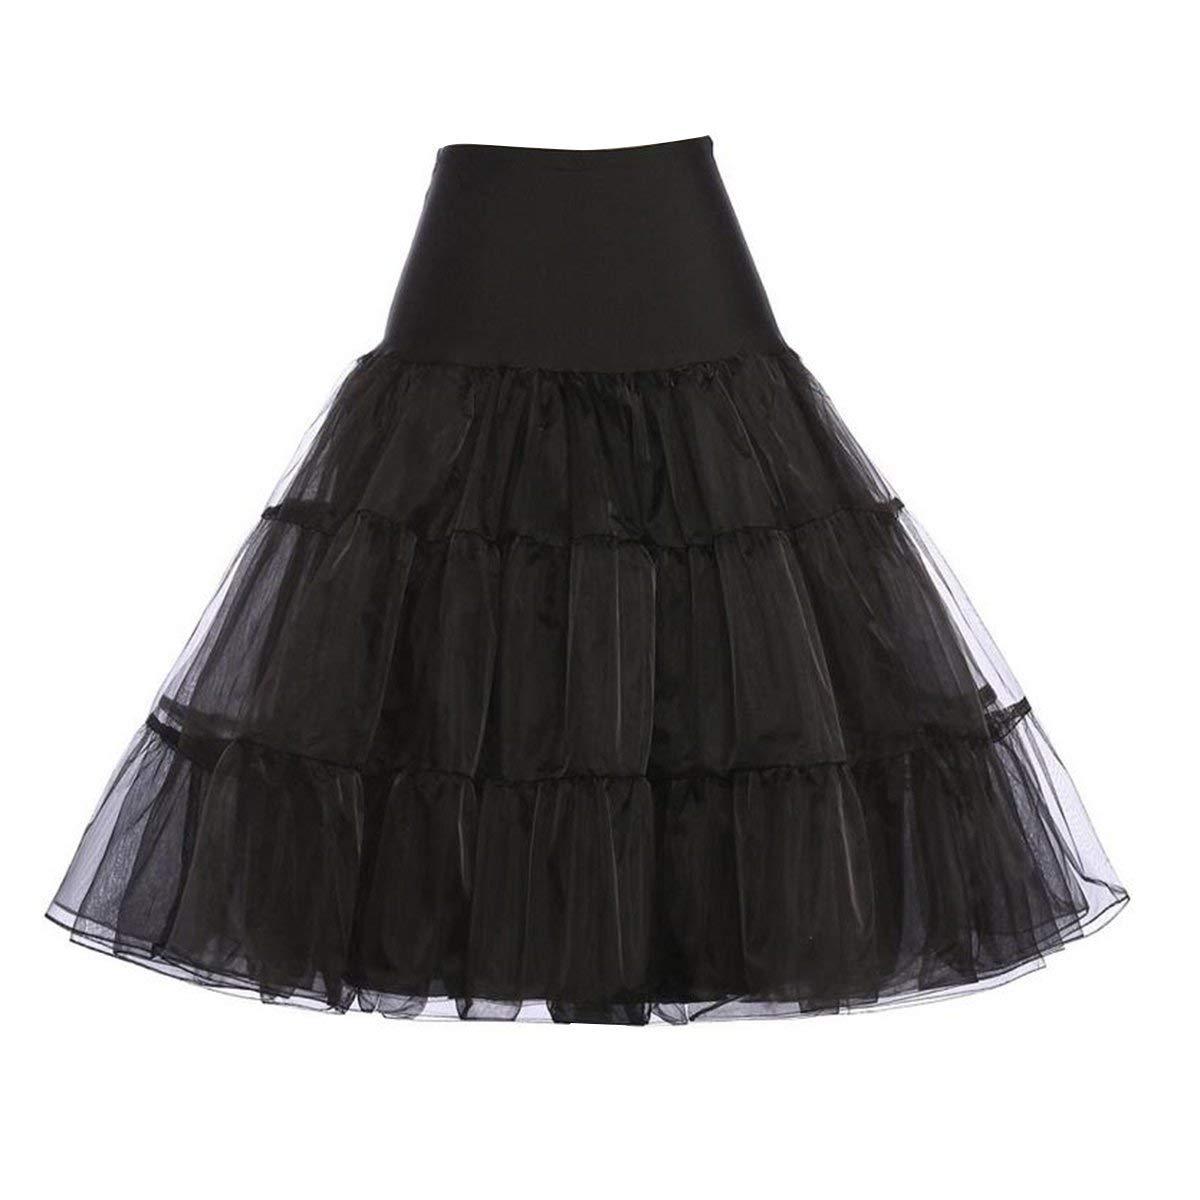 OULII Women's 50s Petticoat Underskirt Tutu Crinoline Skirts Ballerina Skirt Dress Size M (Black)